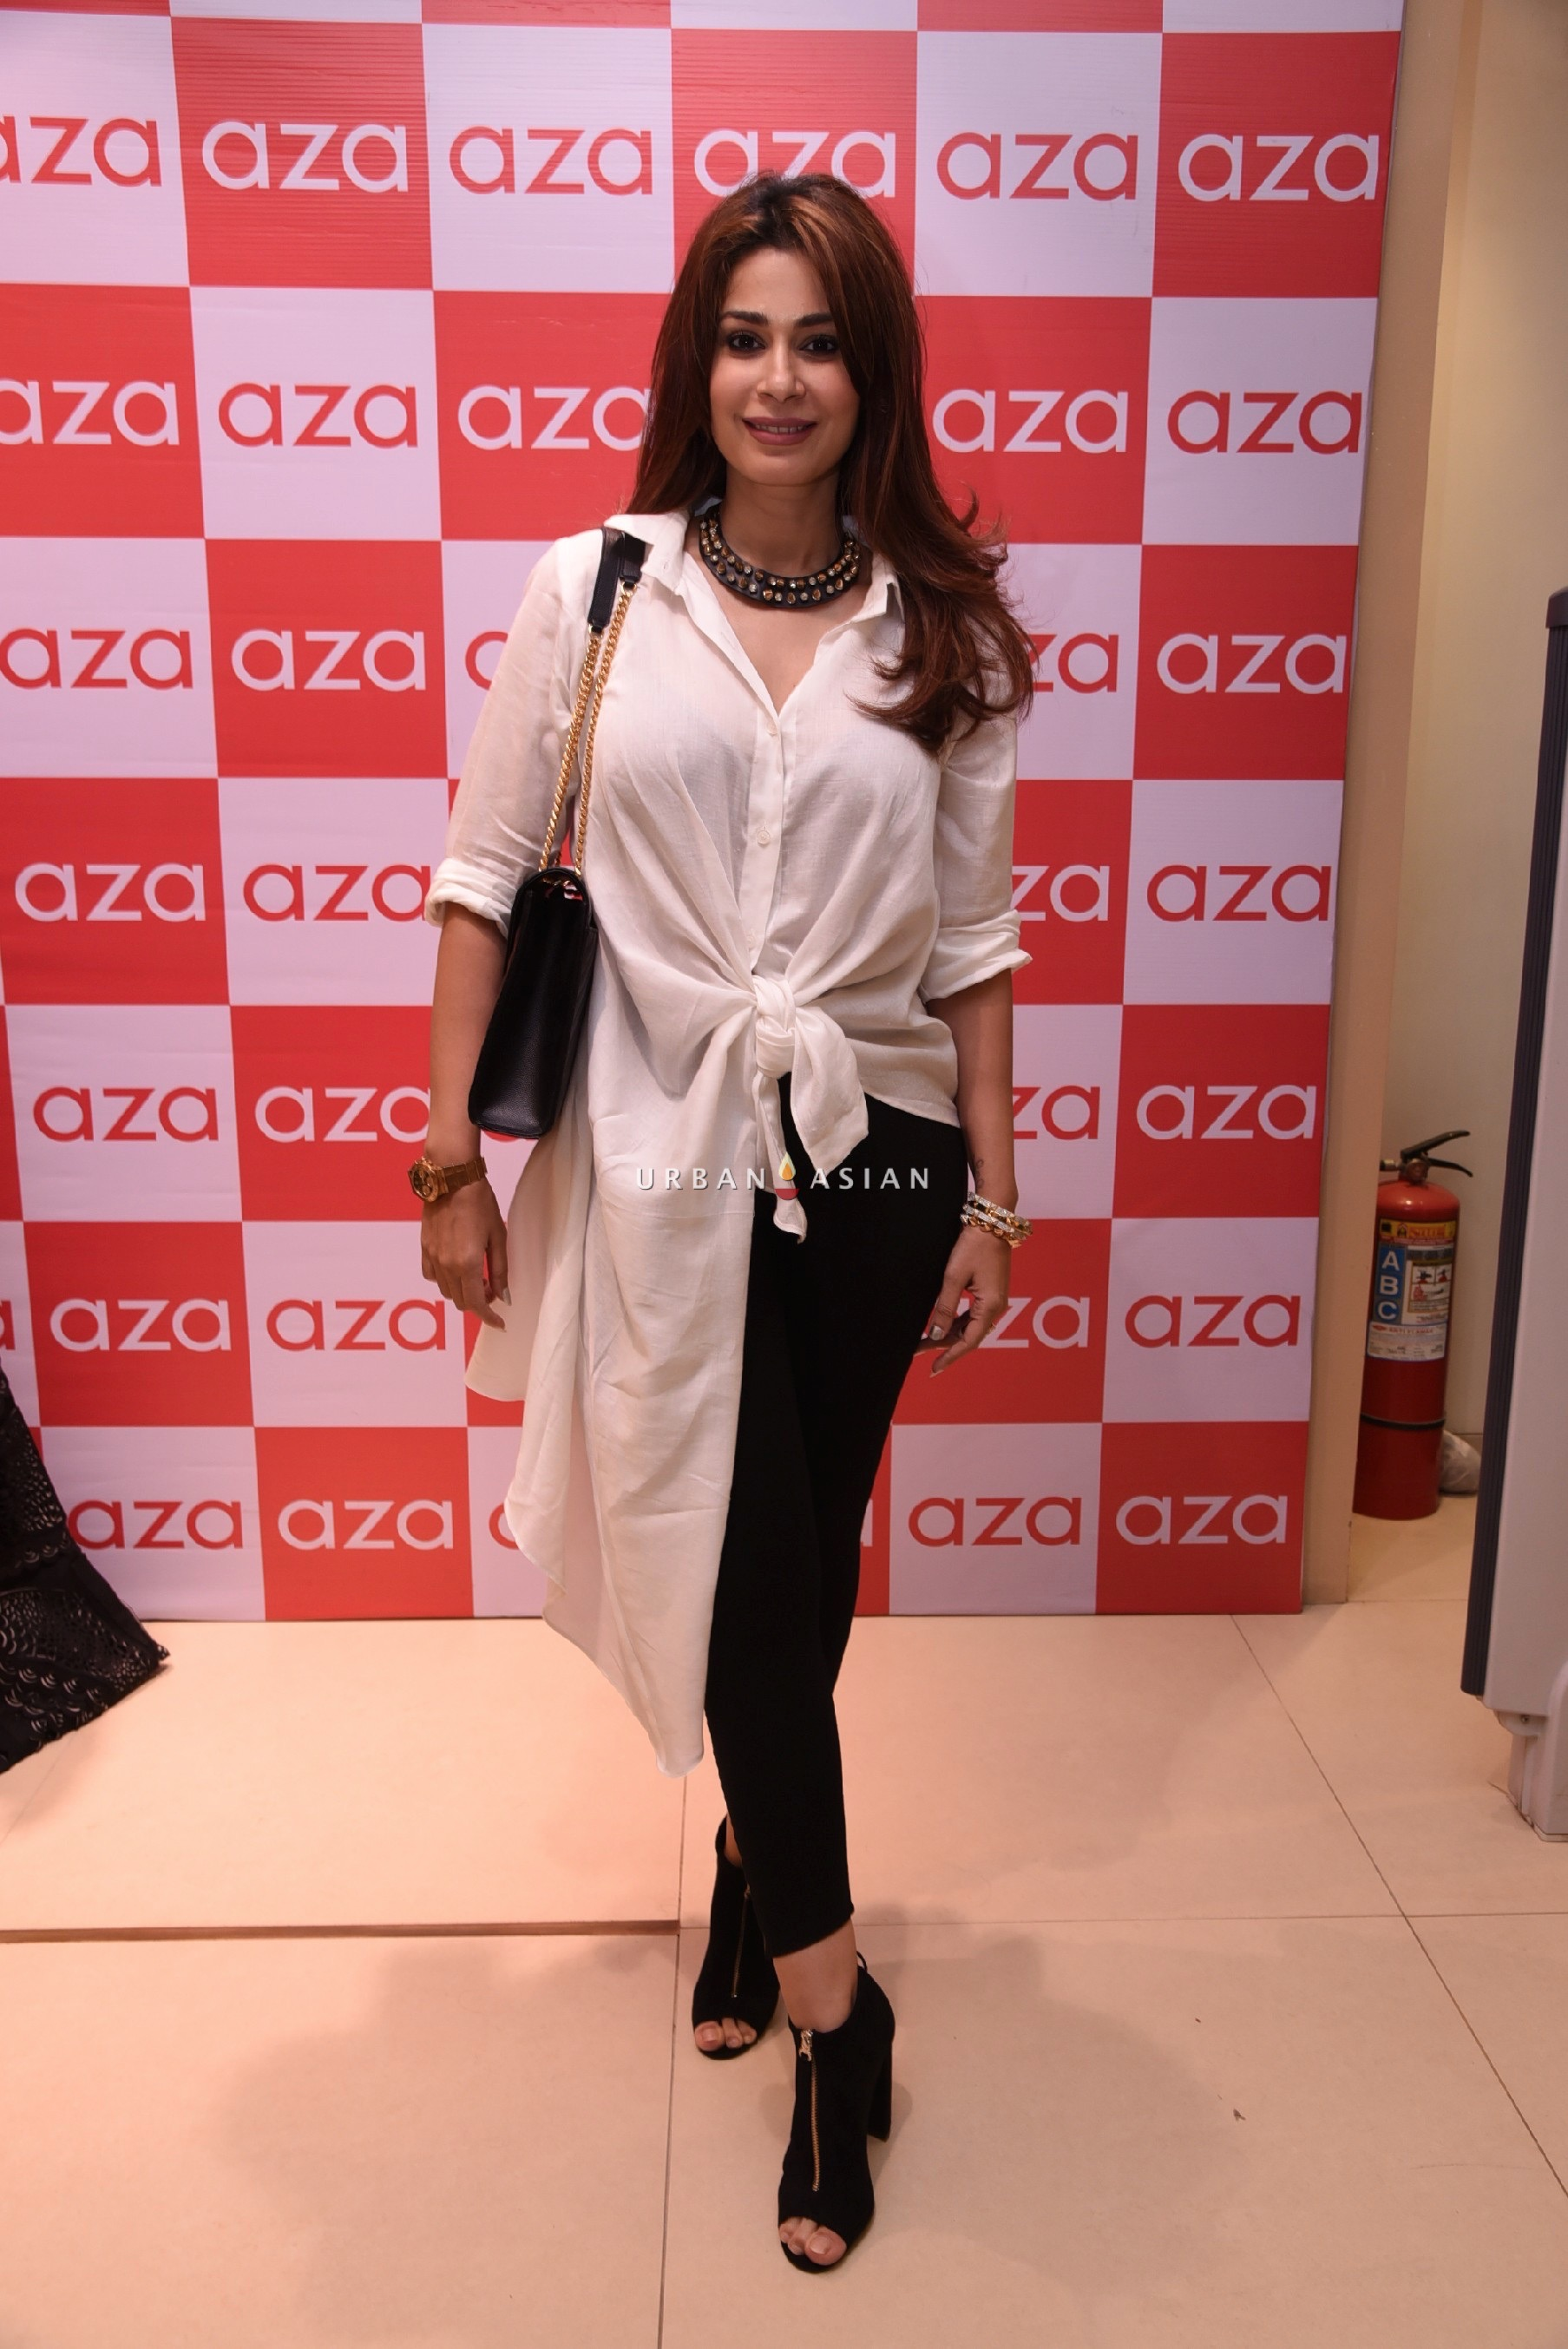 shaheen-abbas-eshaa-amiins-new-party-wear-launch-at-aza